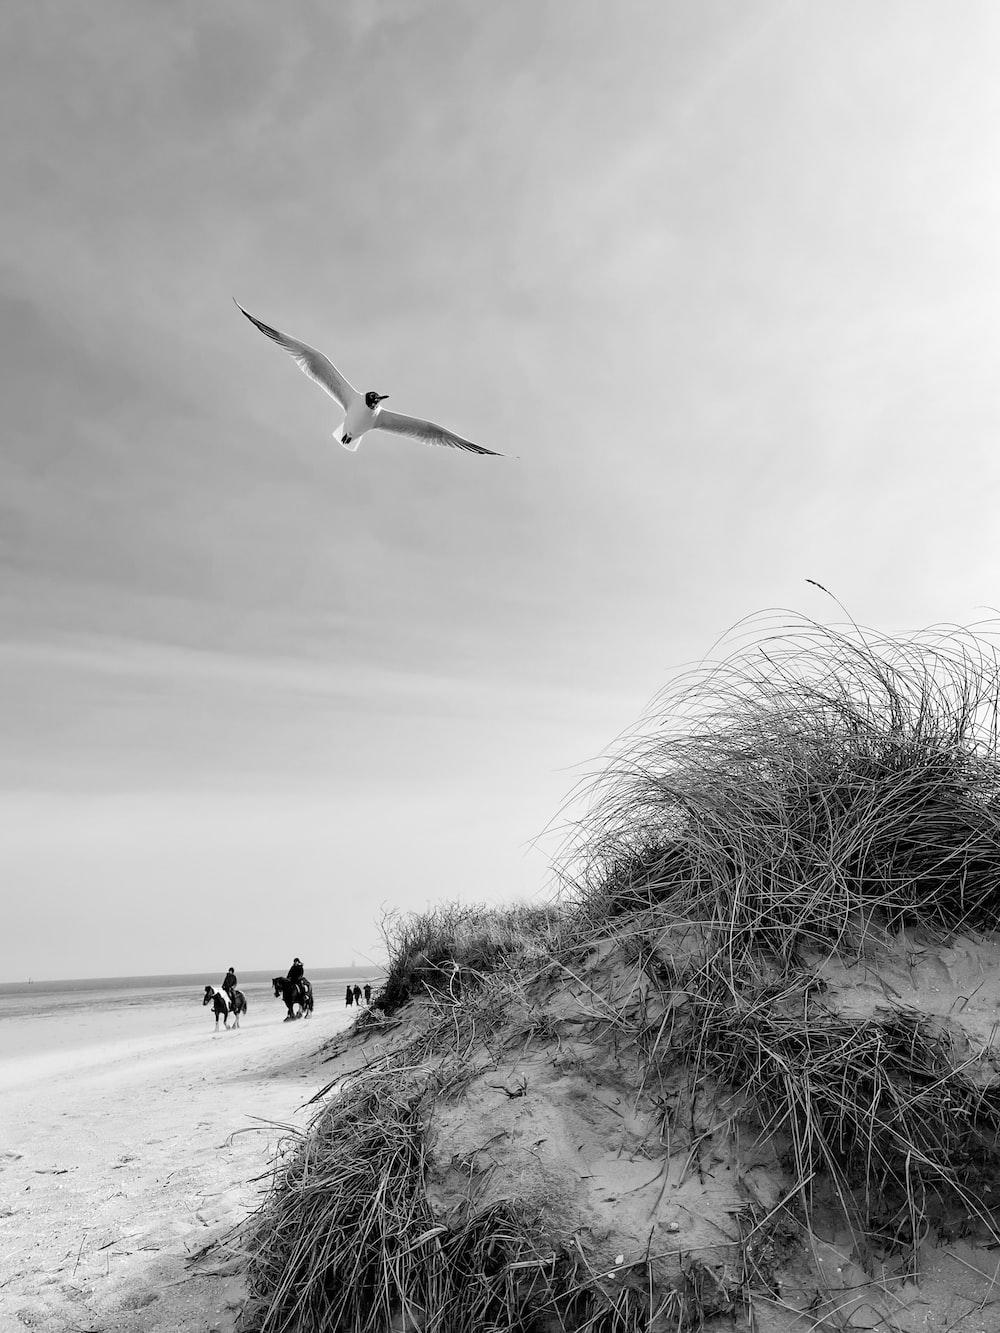 grayscale photo of people walking on beach